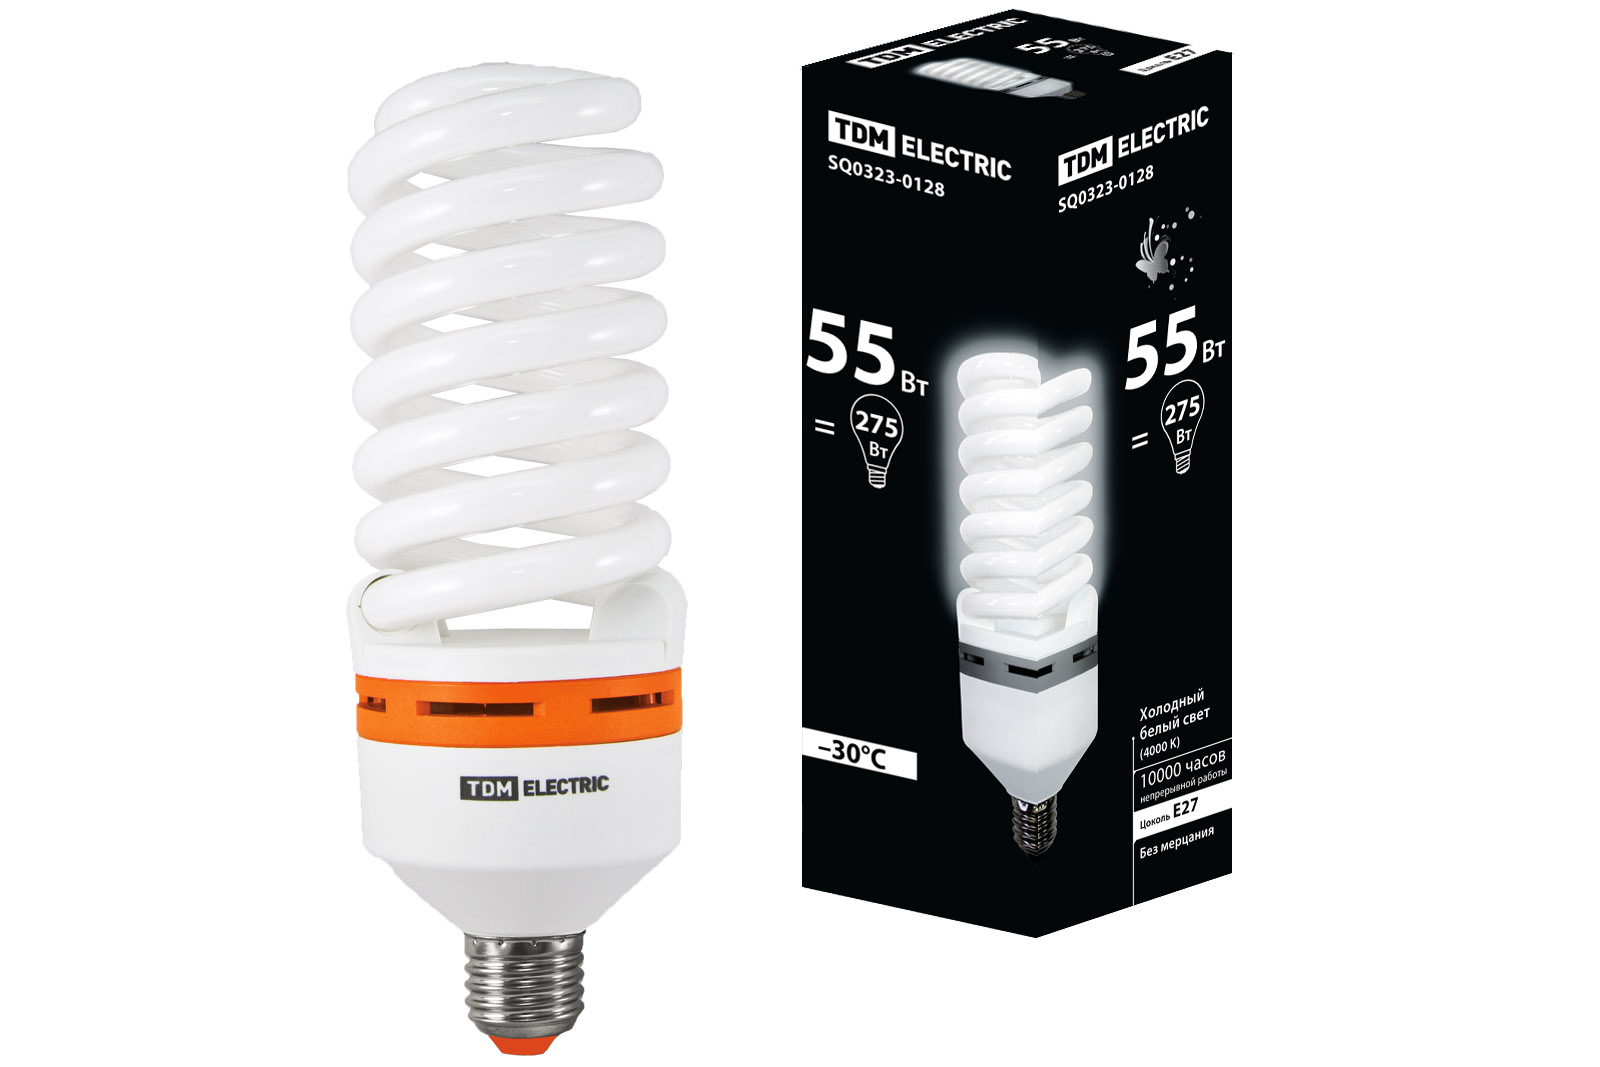 Лампа энергосберегающая Tdm Sq0323-0128 лампа энергосберегающая tdm sq0323 0054